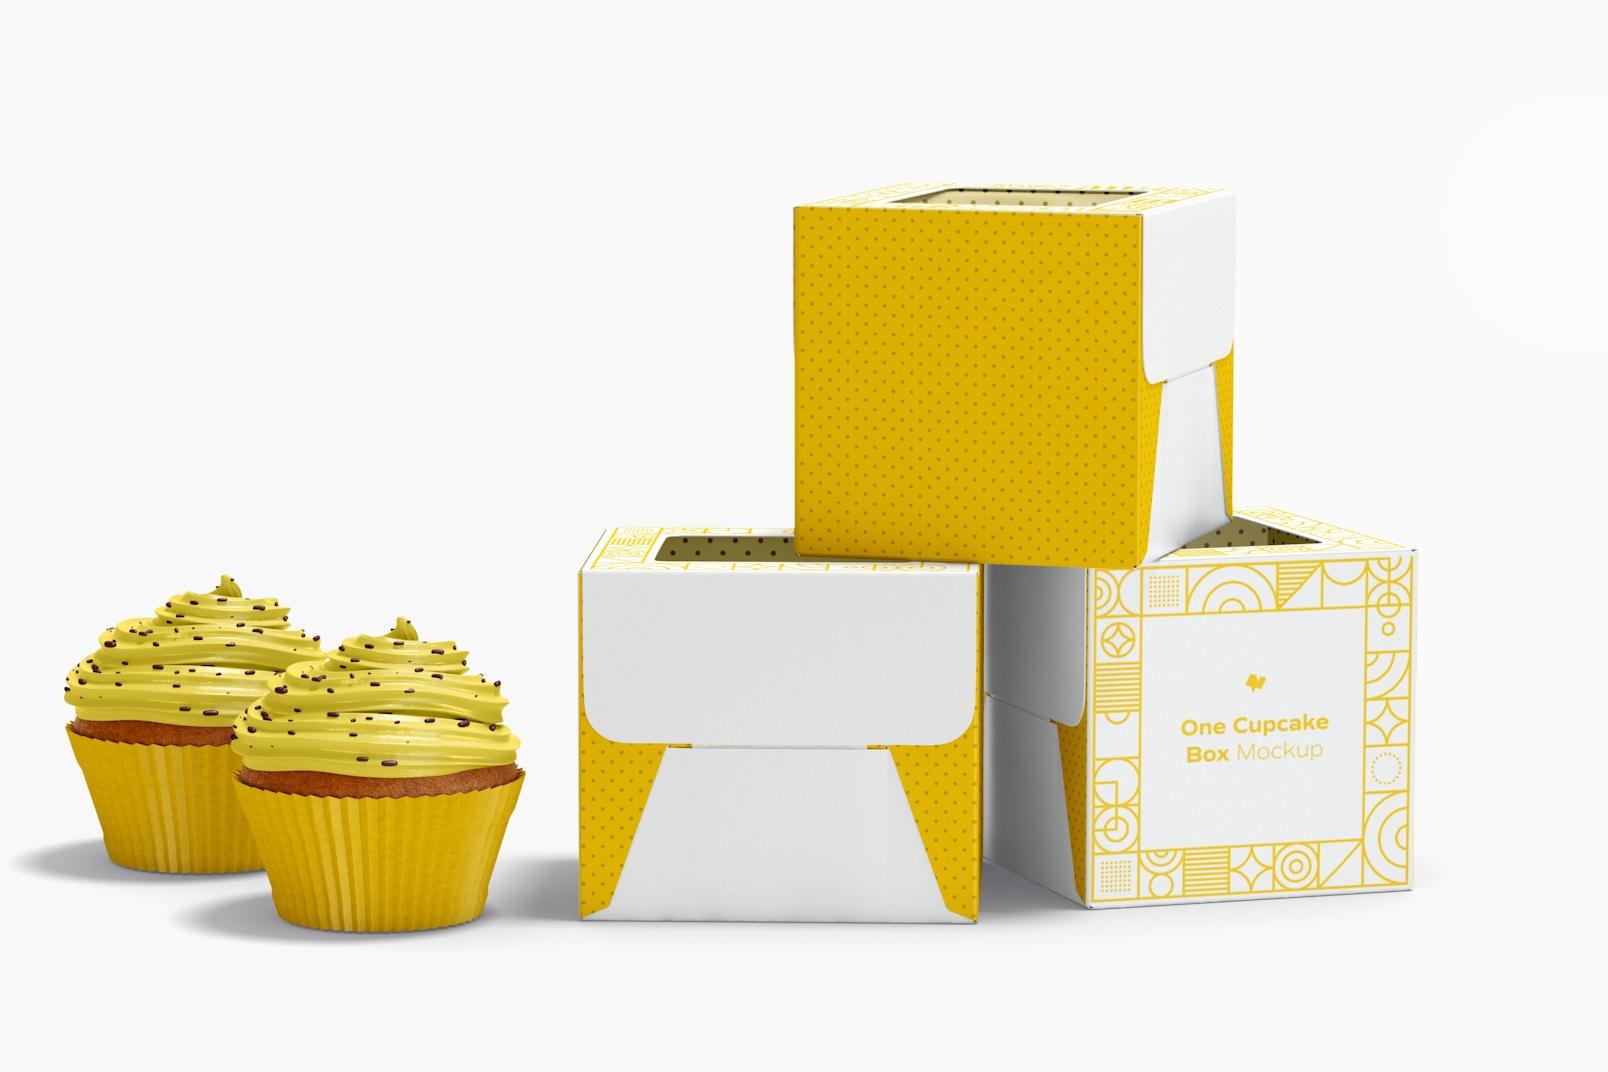 One Cupcake Boxes Mockup, Closed